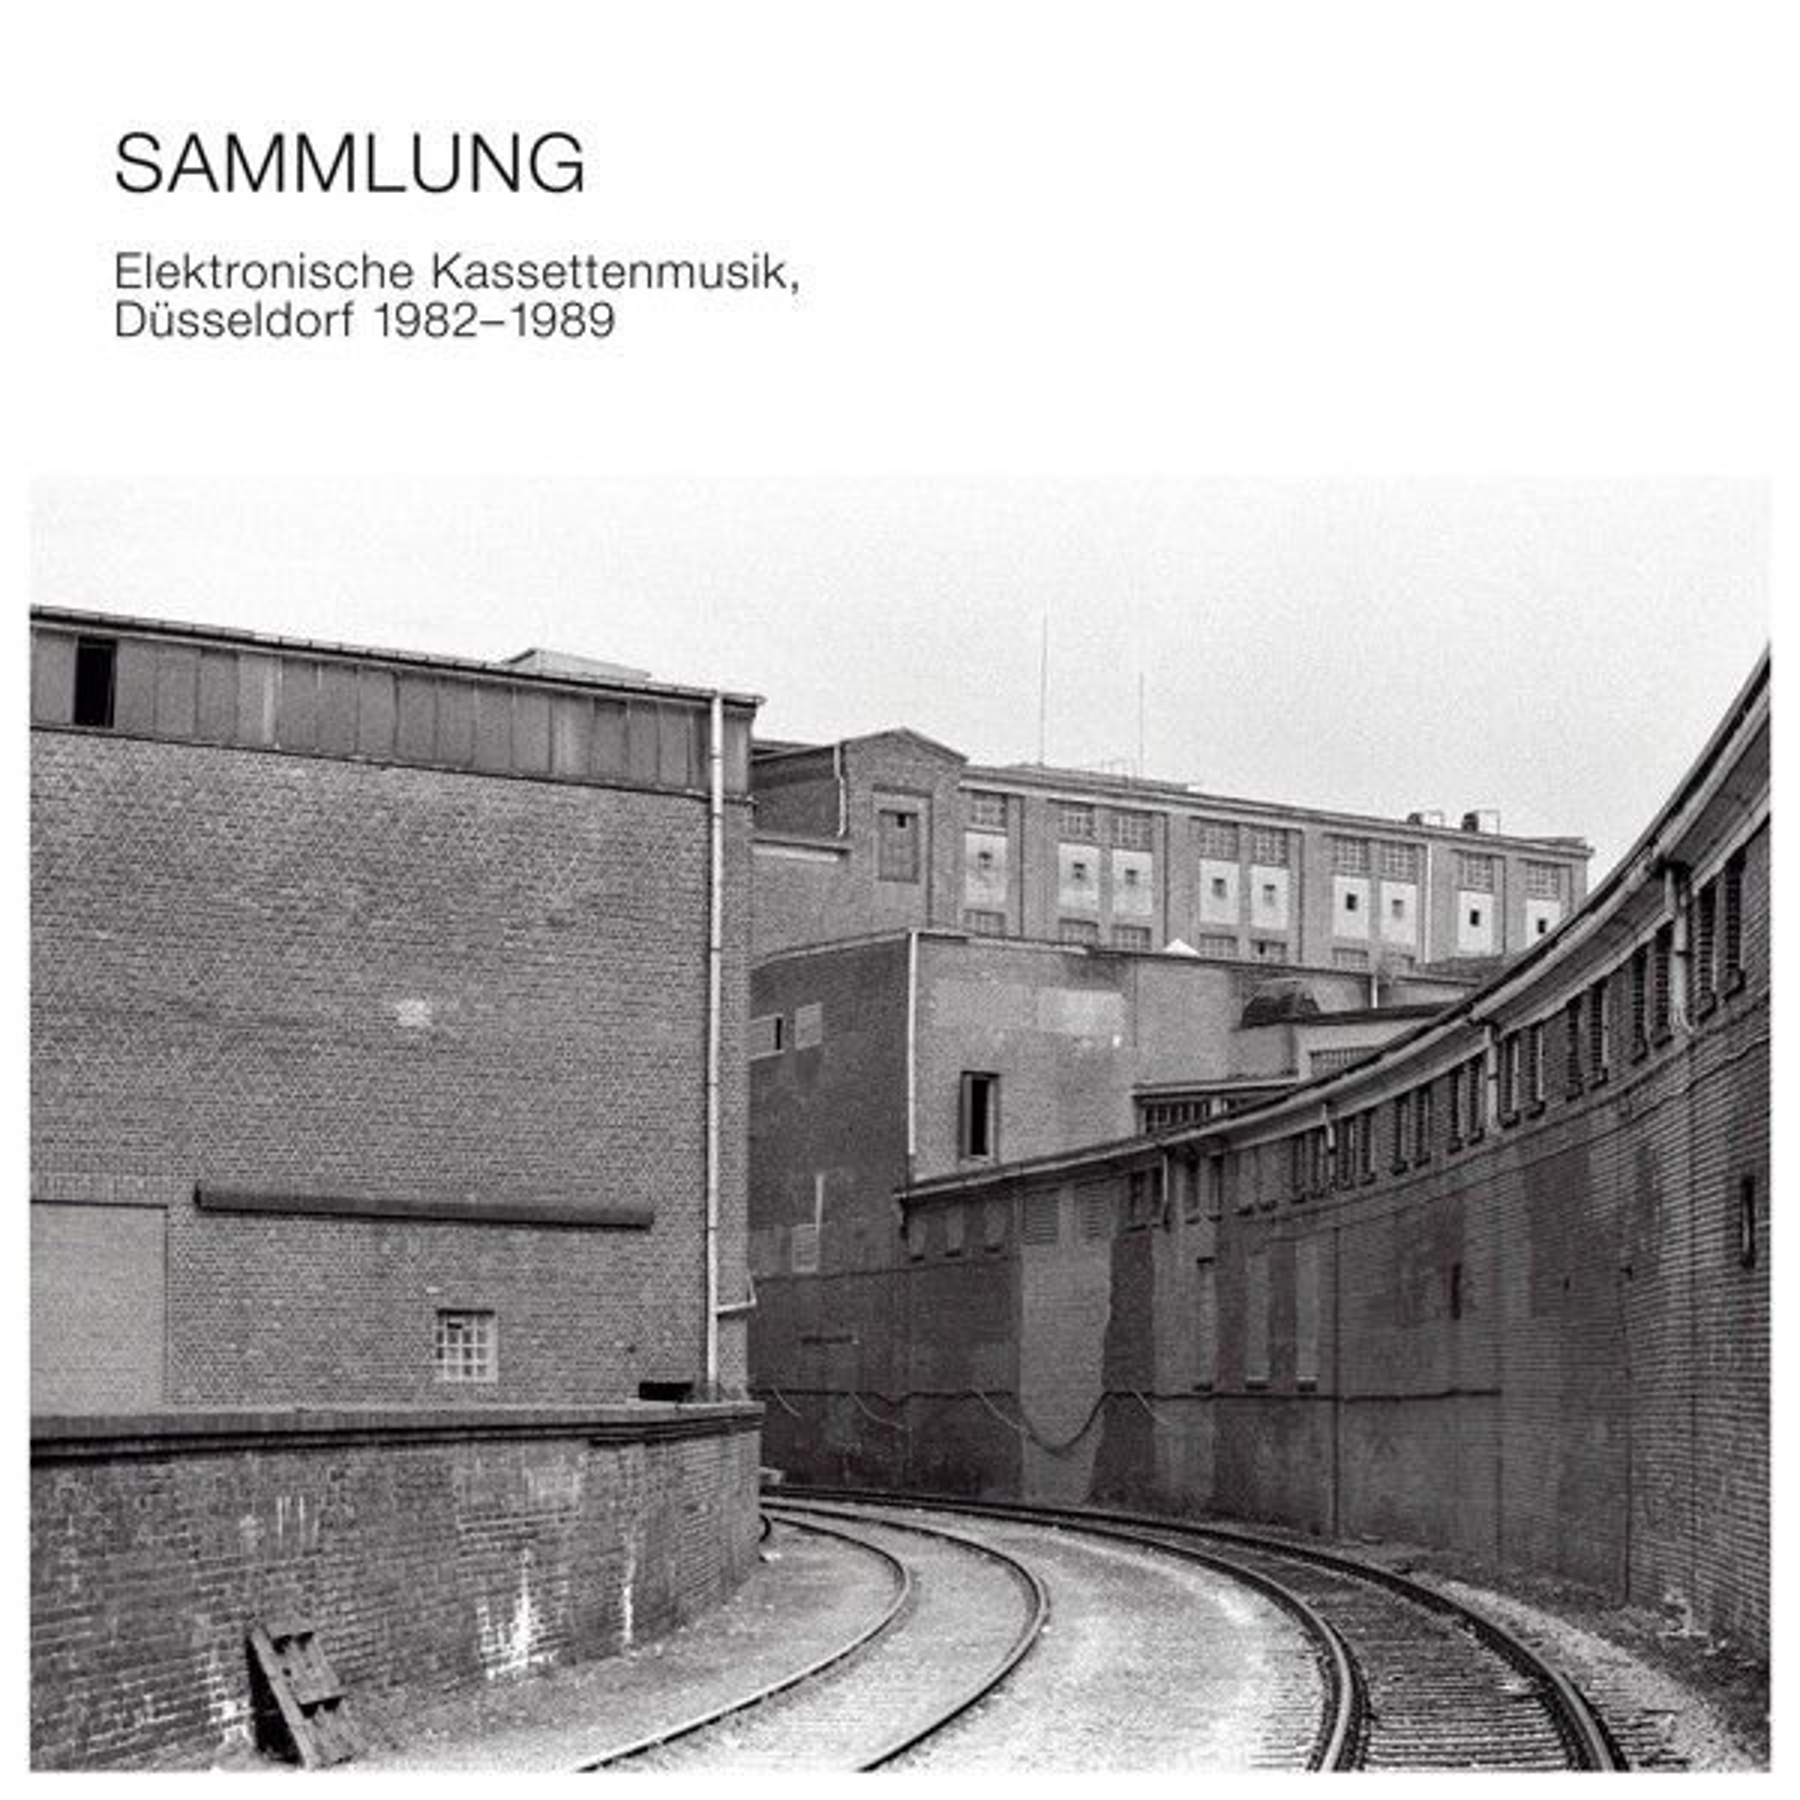 V.A. - Sammlung-Elektronische Kassettenmusik - Düsseldorf 1982-1989 - LP